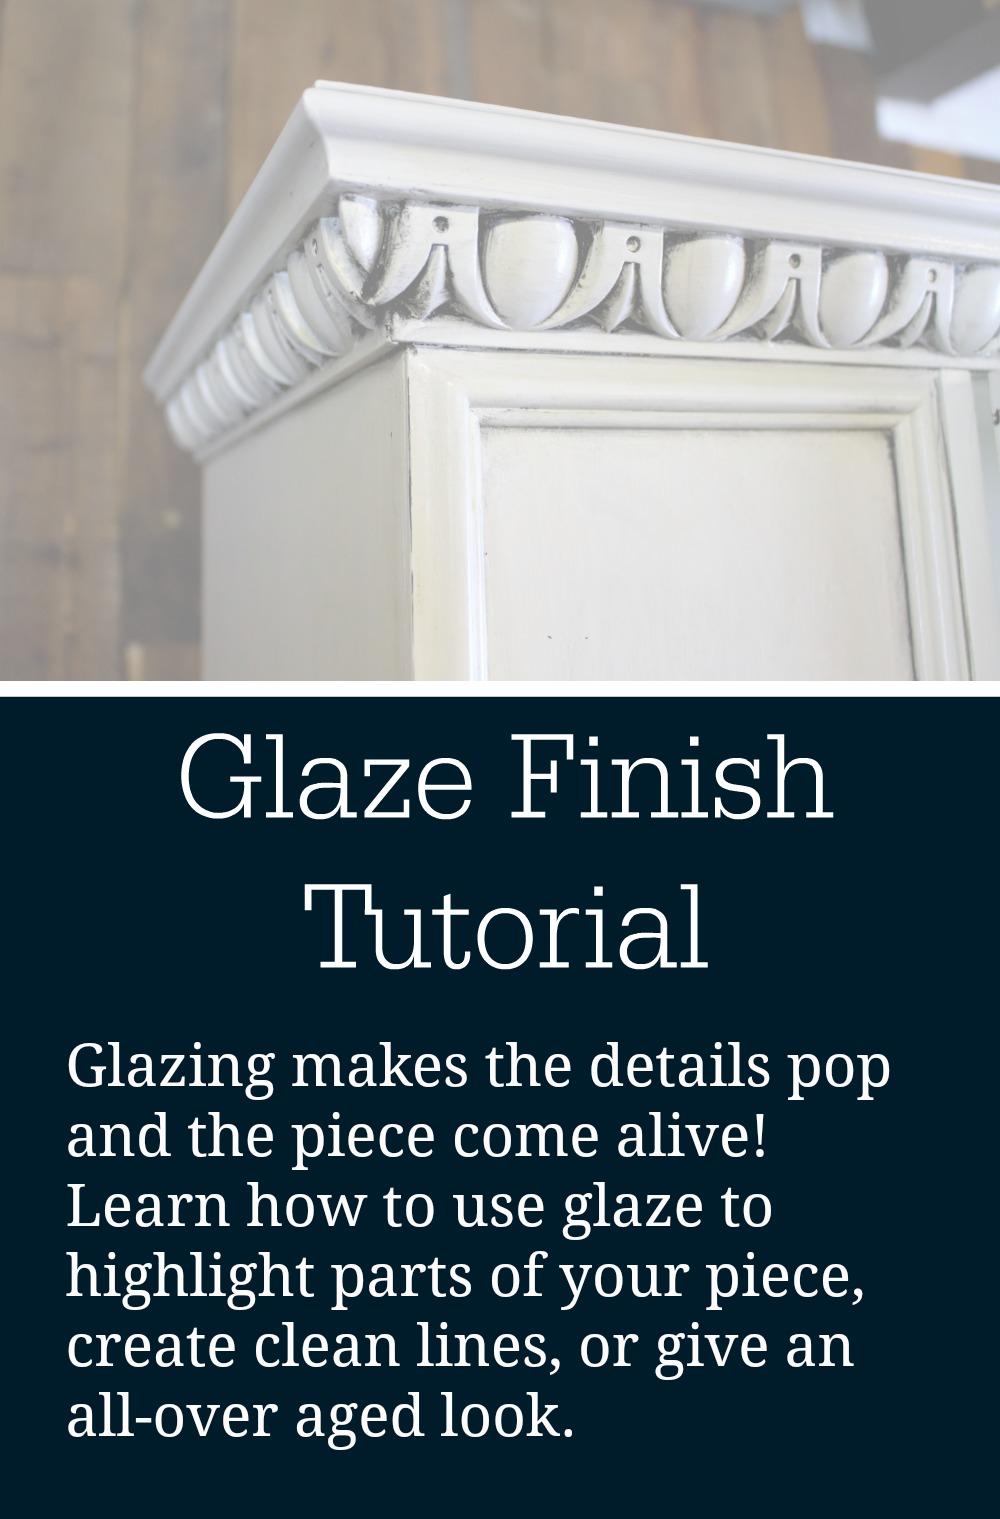 glaze class title